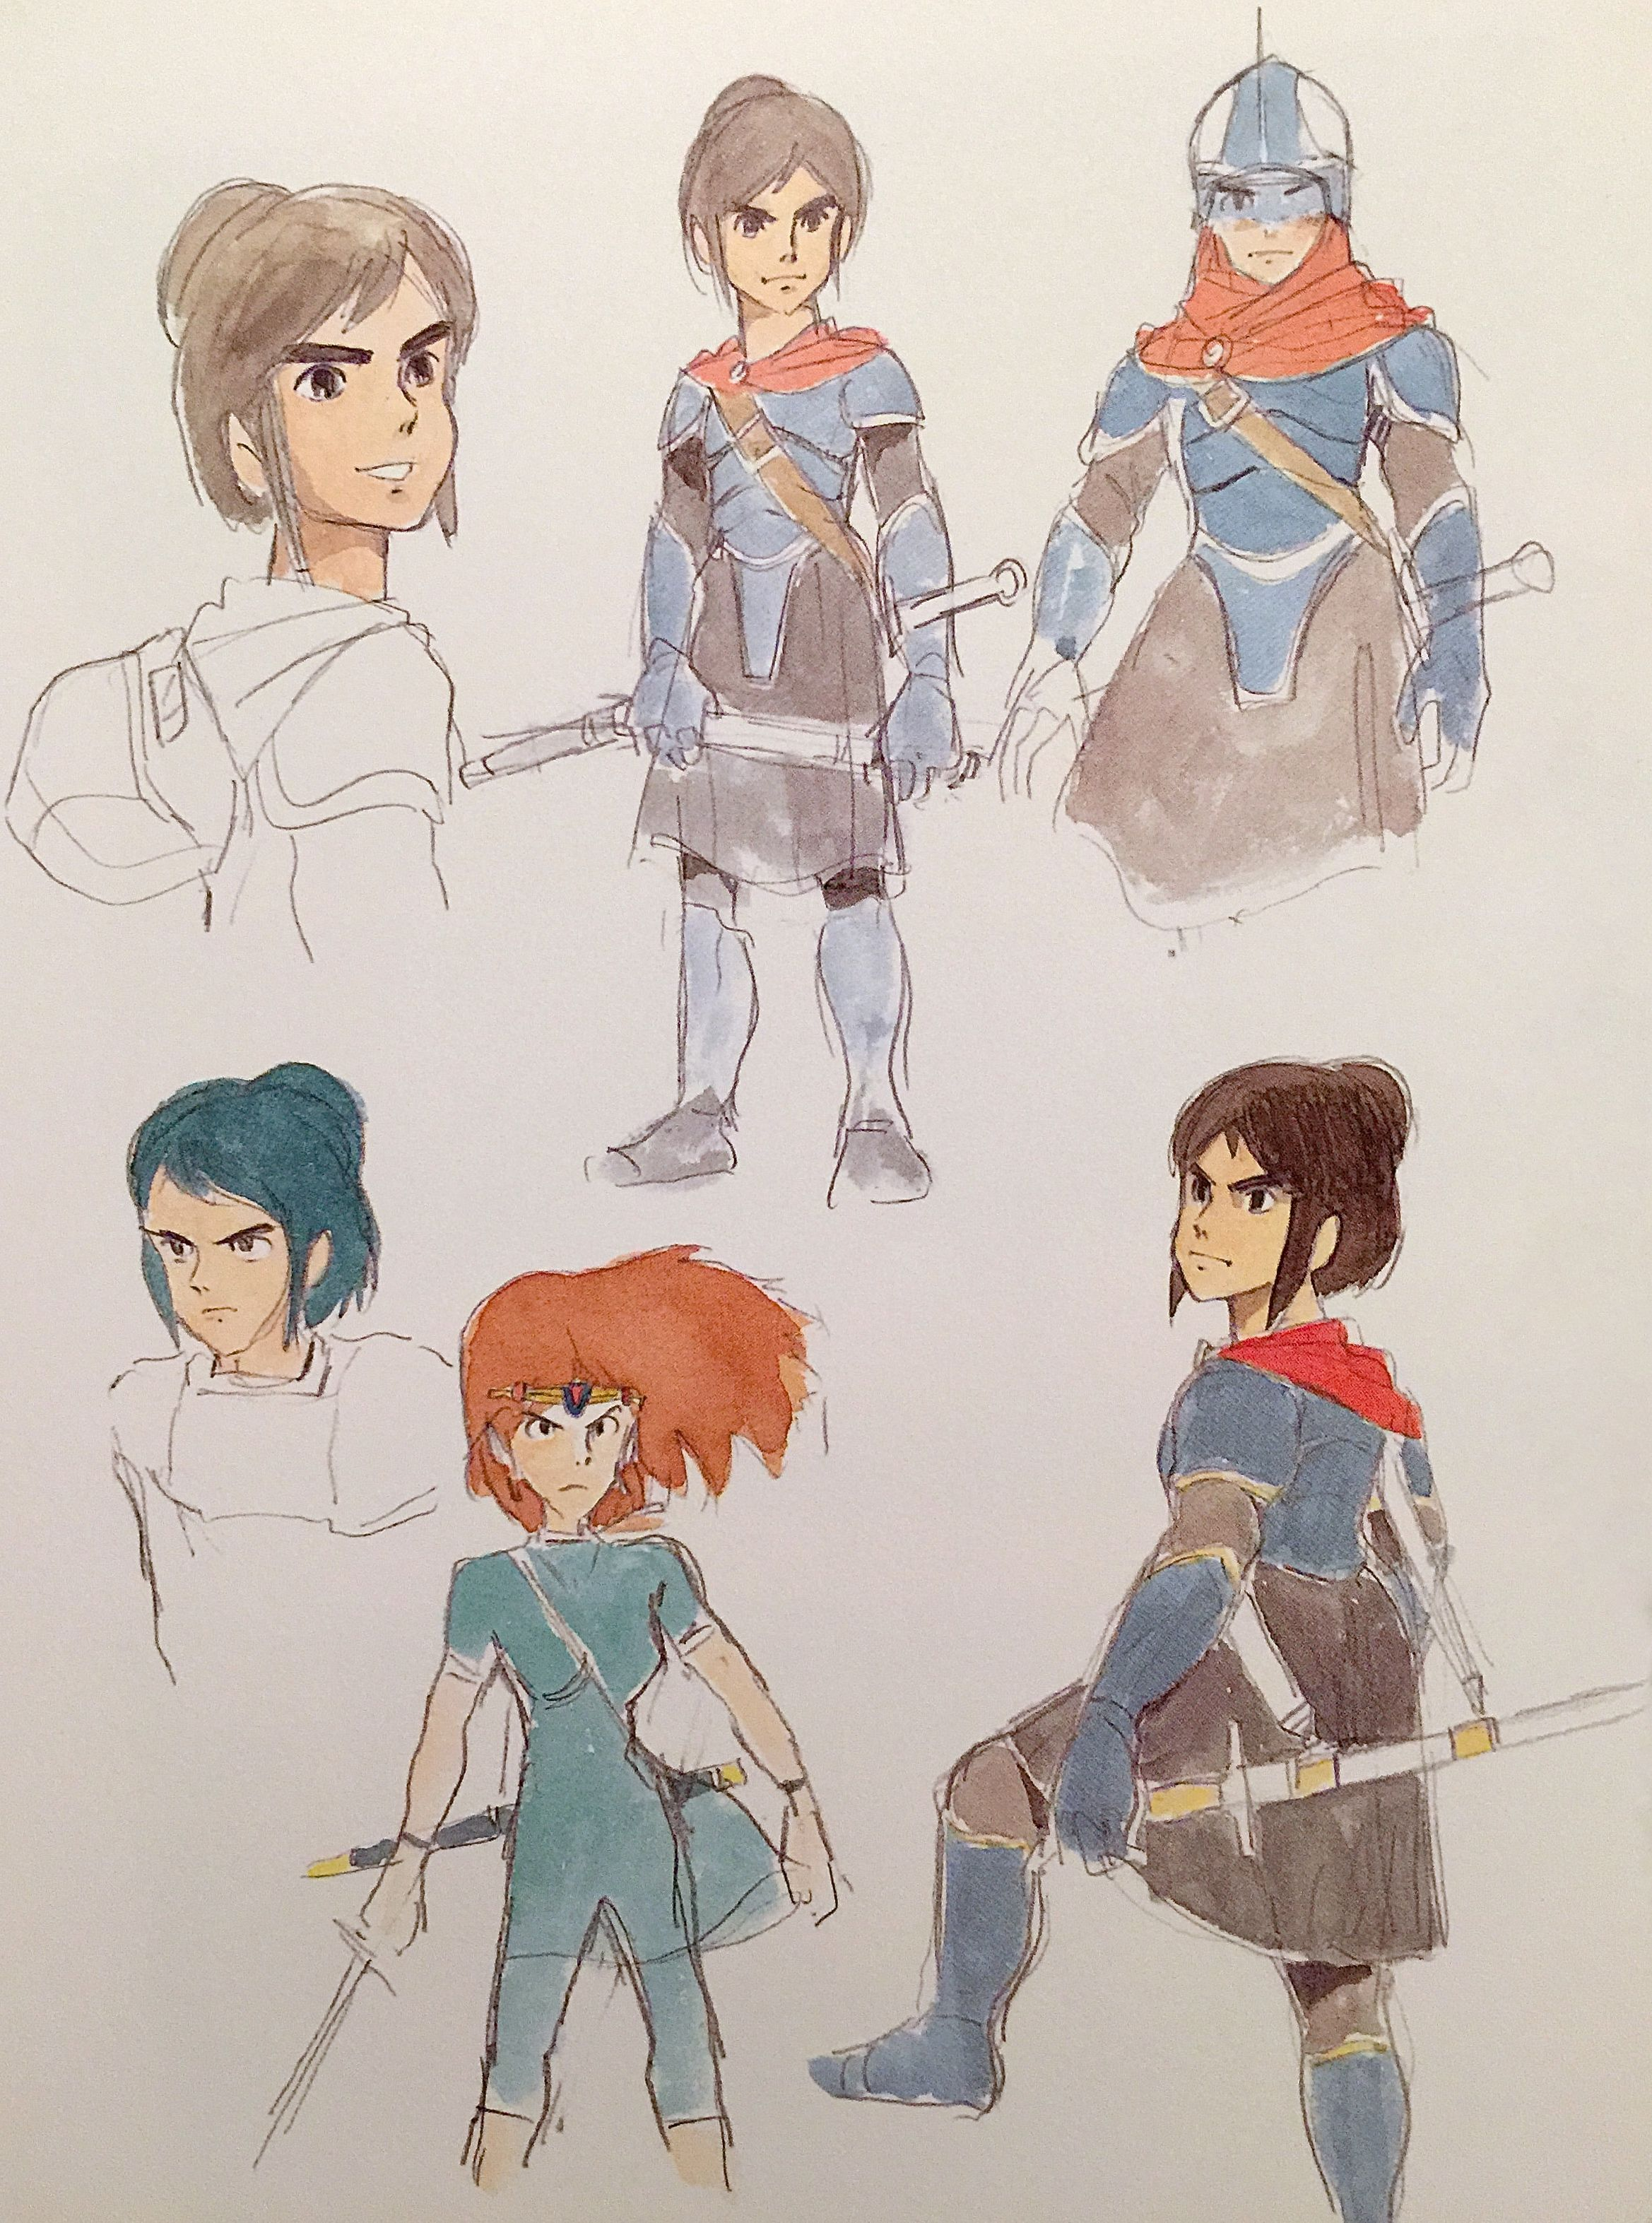 Period Drama Motif The Drawings Miyazaki Accumulated Between 1980 1982 Formed The Basis For The Wor With Images Studio Ghibli Art Studio Ghibli Characters Ghibli Art